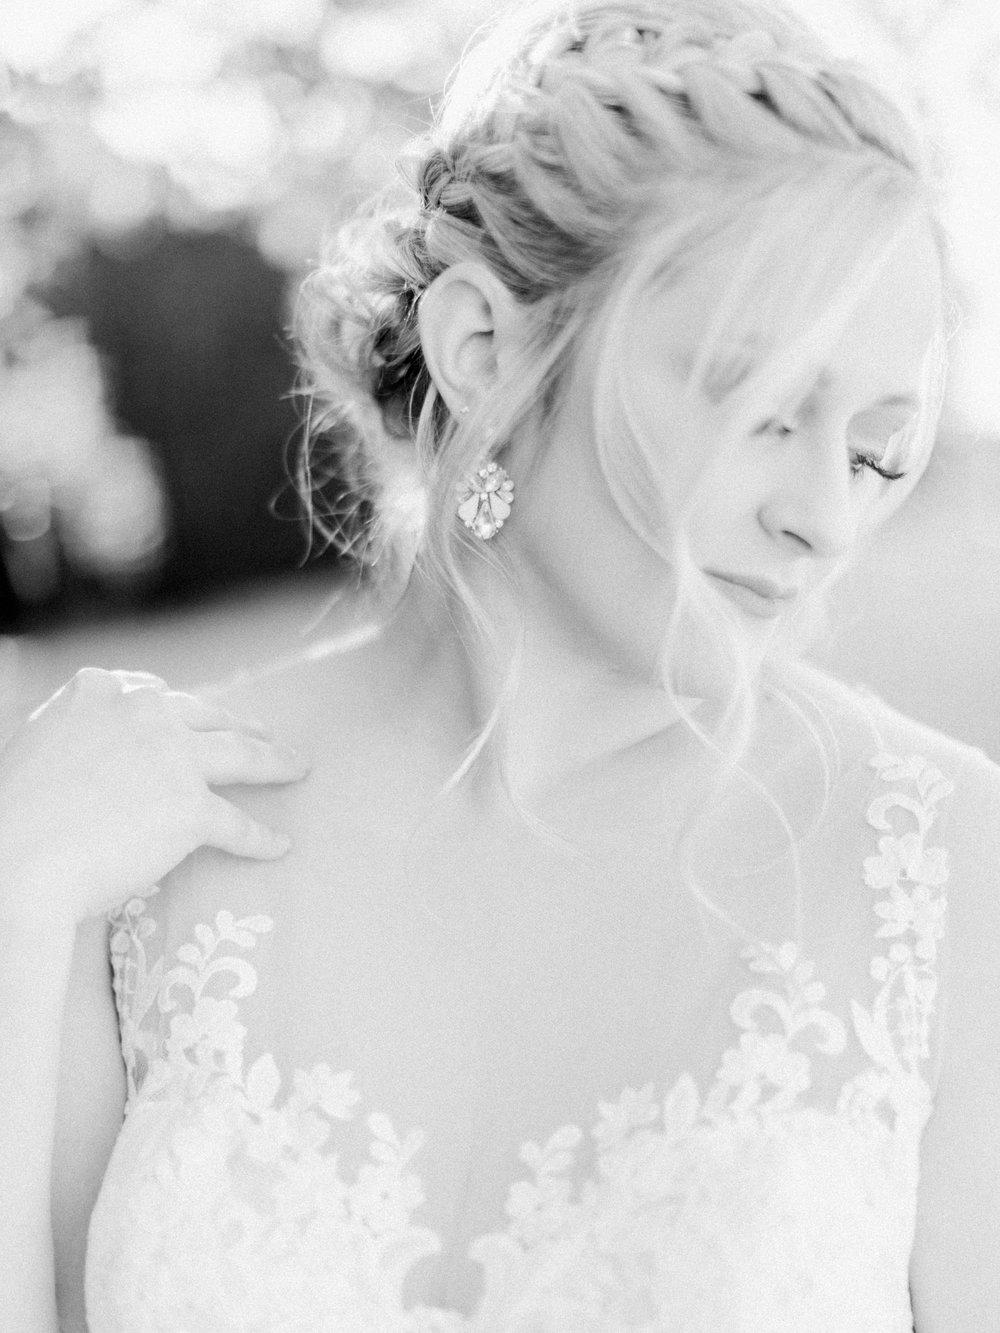 Wichita Falls, TX - Romantic Photography